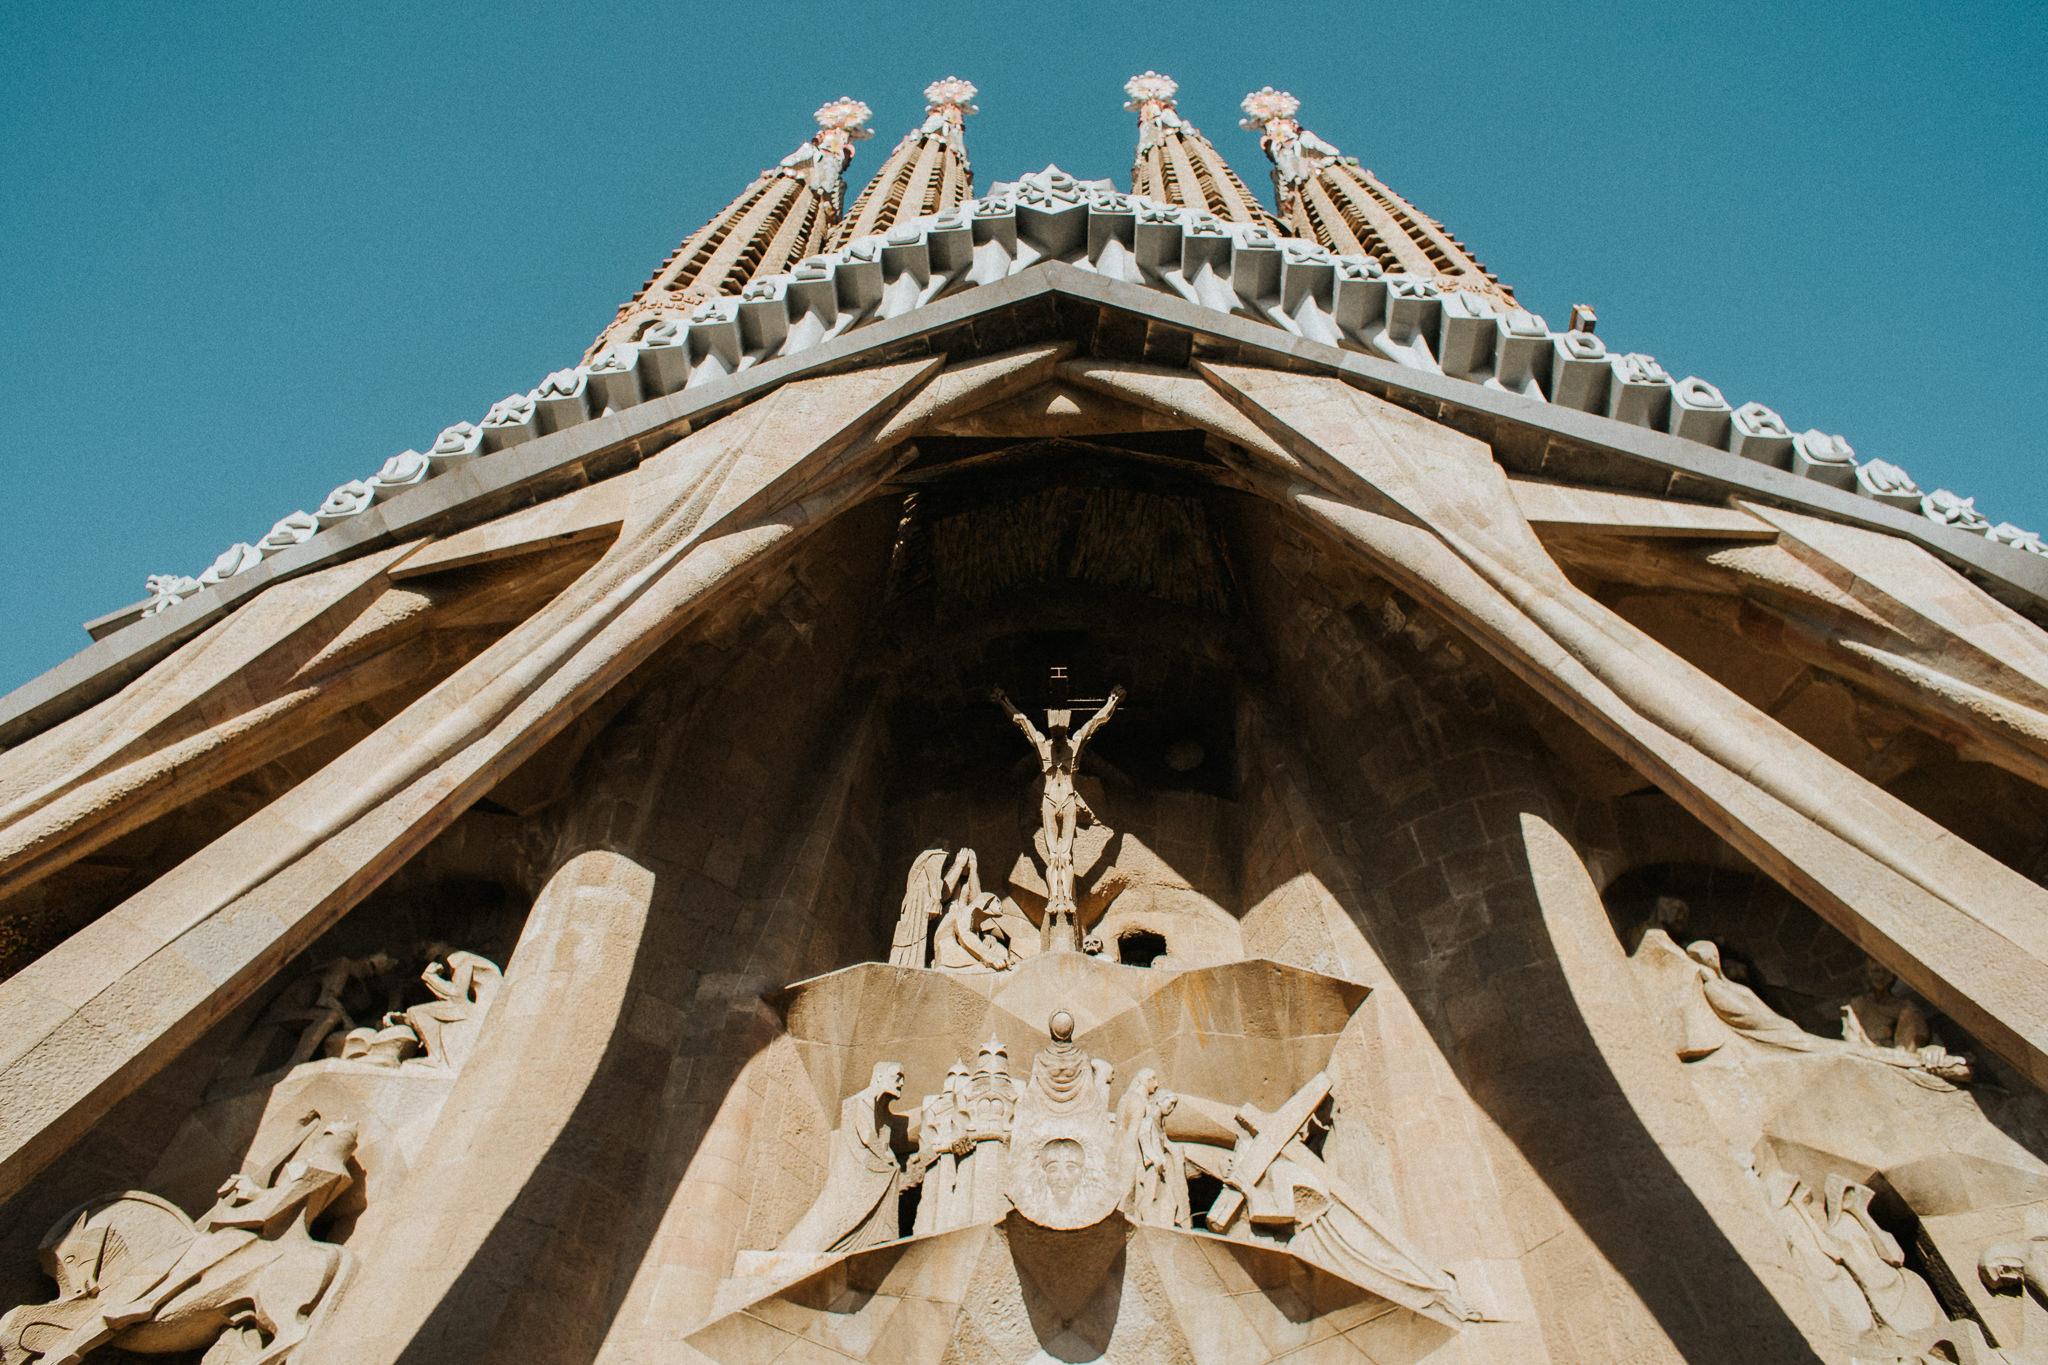 Barcelona-destination-photographer-alfred-tang-10.jpg